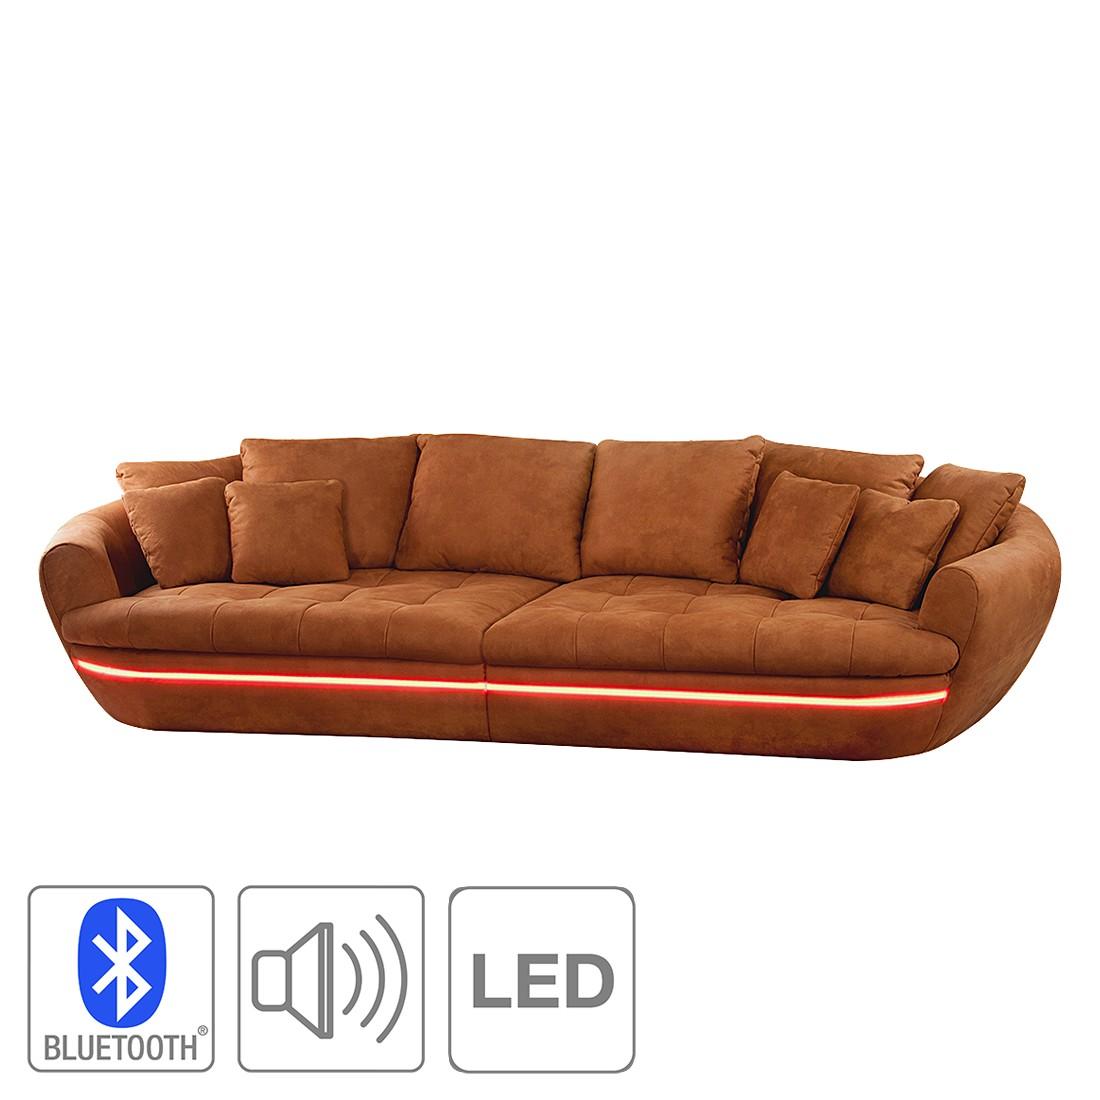 EEK A+, Bigsofa Camrose (inkl. Beleuchtung) – Microfaser Curry – Mit integriertem Bluetooth Soundsystem, loftscape kaufen